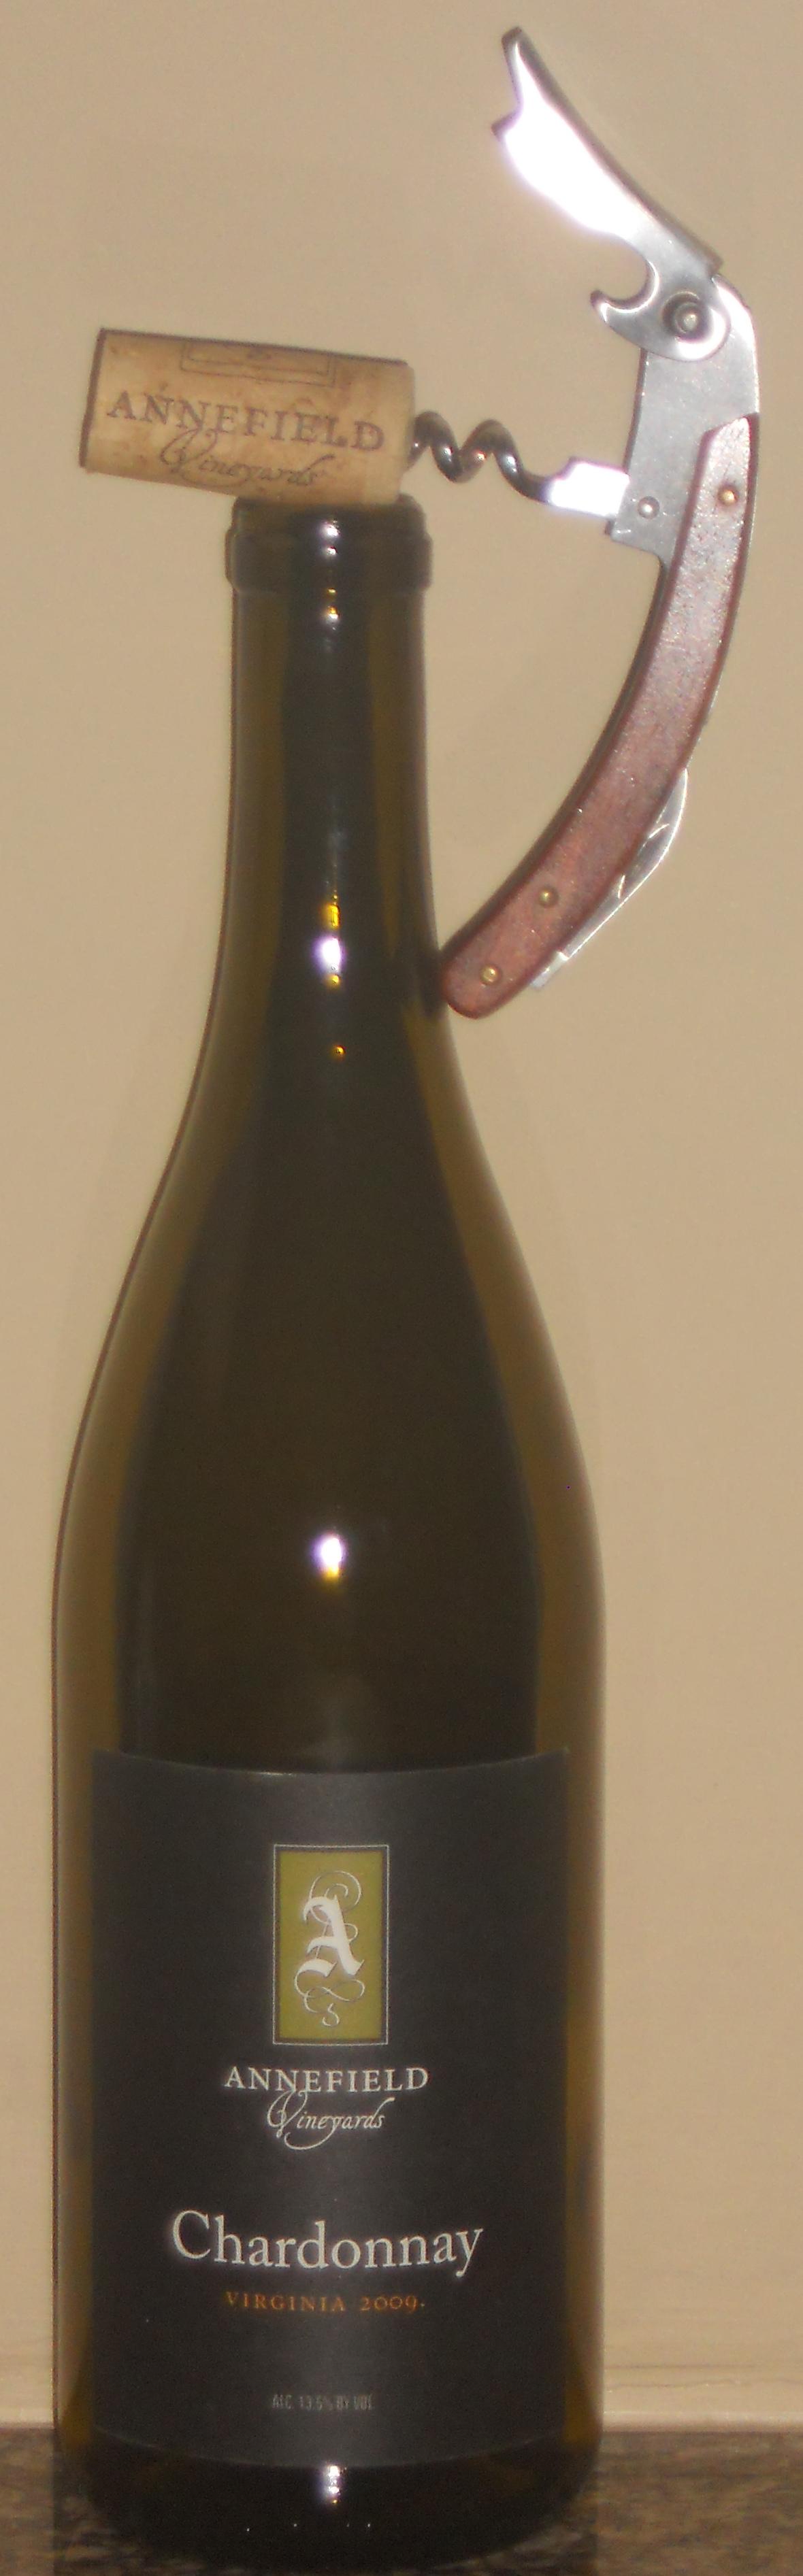 2009 Virginia Chardonnay Tasting, Part Deux